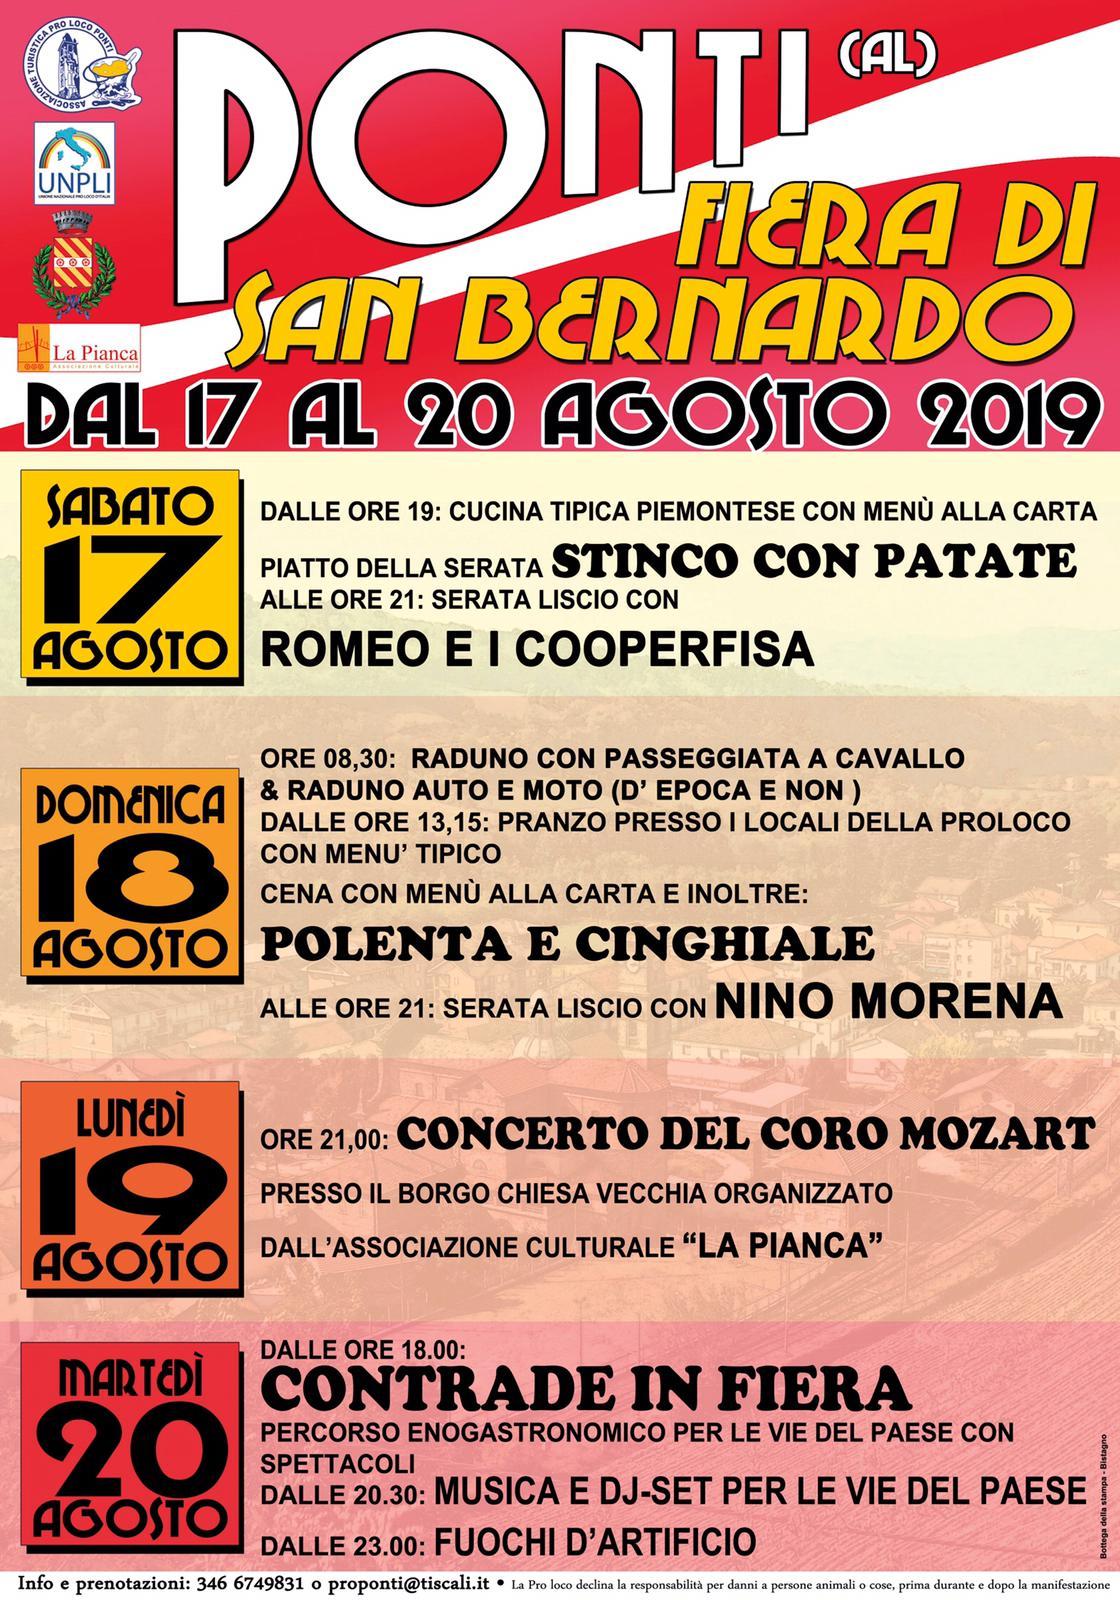 Fiera di San Bernardo 2019 - Ponti